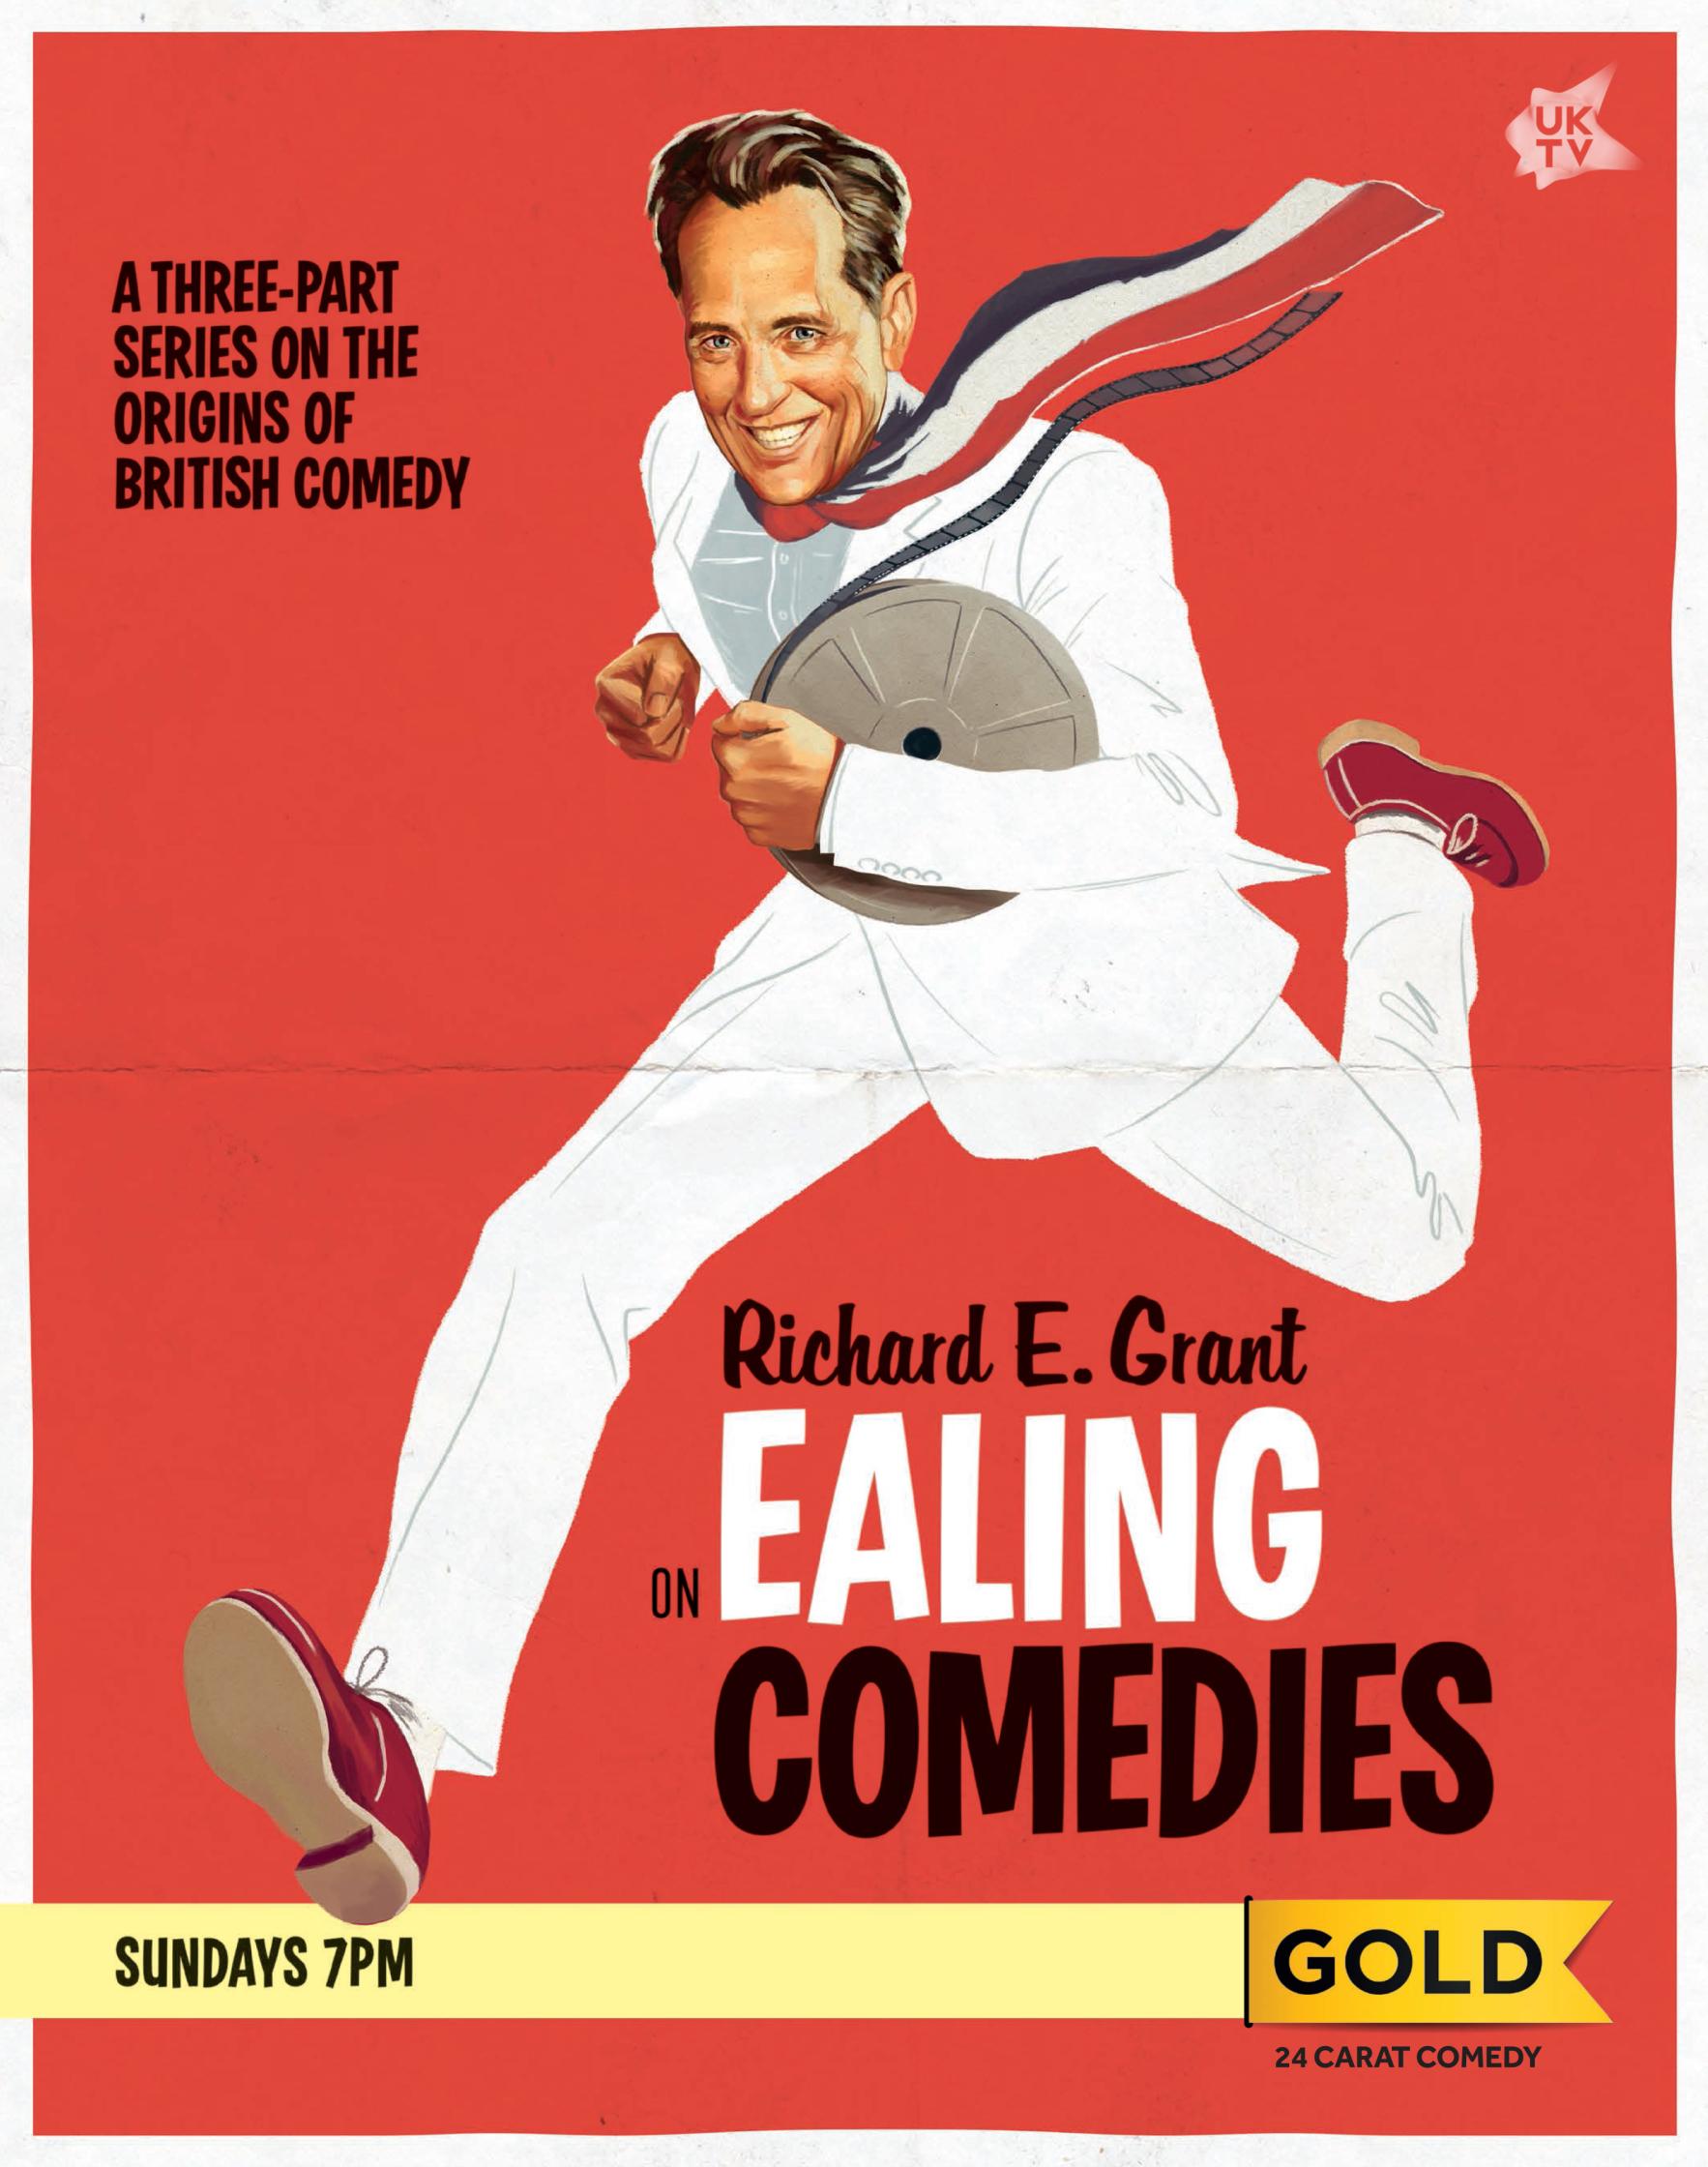 J000706_UKTV_Ealing_Comedies_340x268mm_v3 (1).jpg